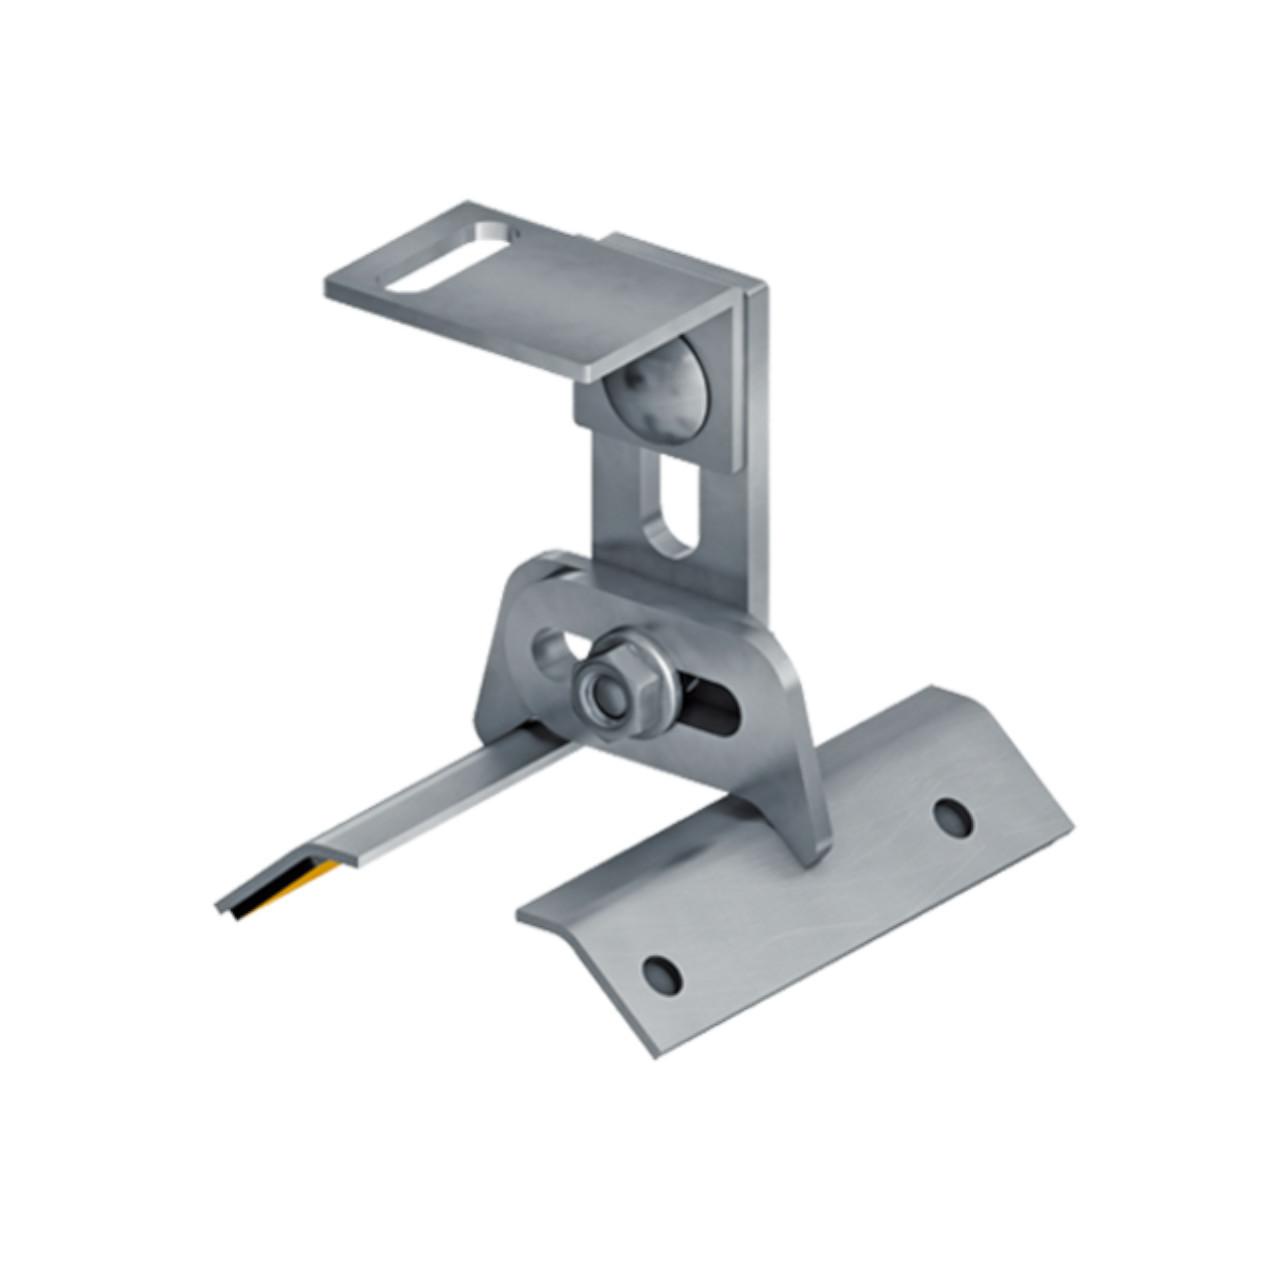 EJOT - Solar ATB - Adjustable Trap Bracket